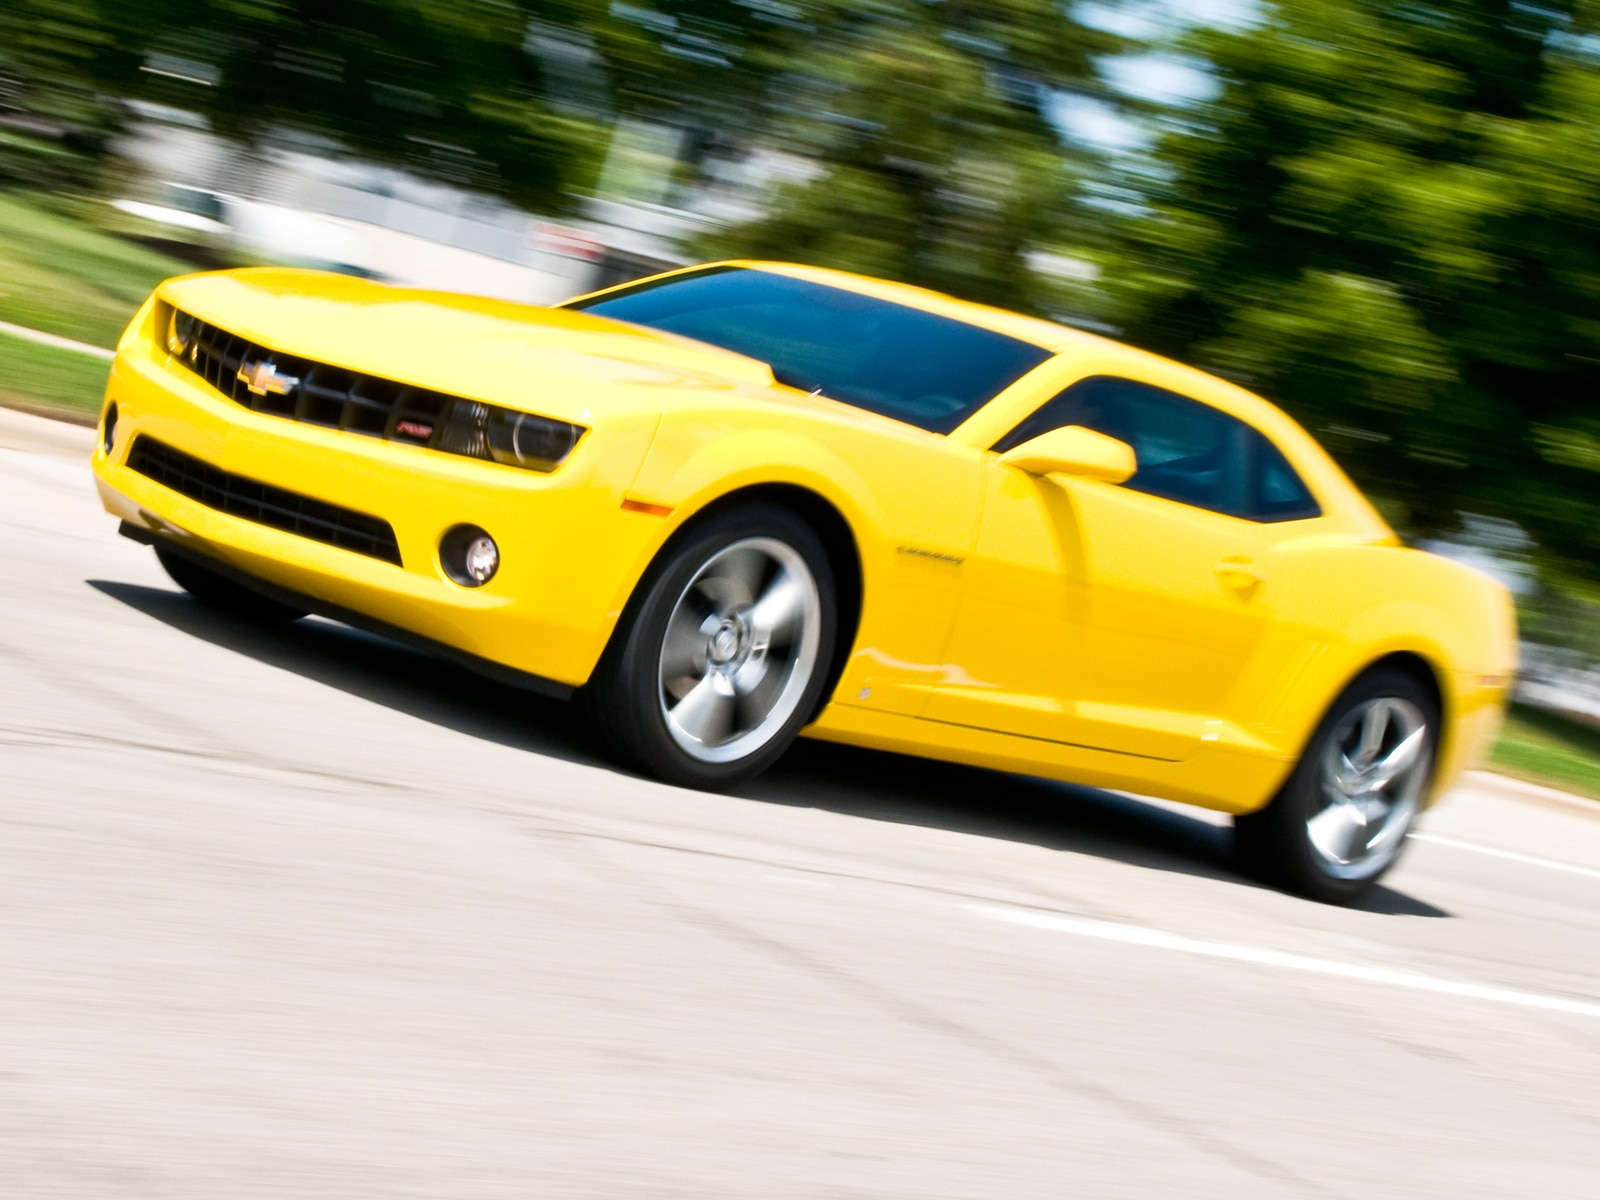 Chevrolet Camaro Yellow HD desktop wallpaper Widescreen High